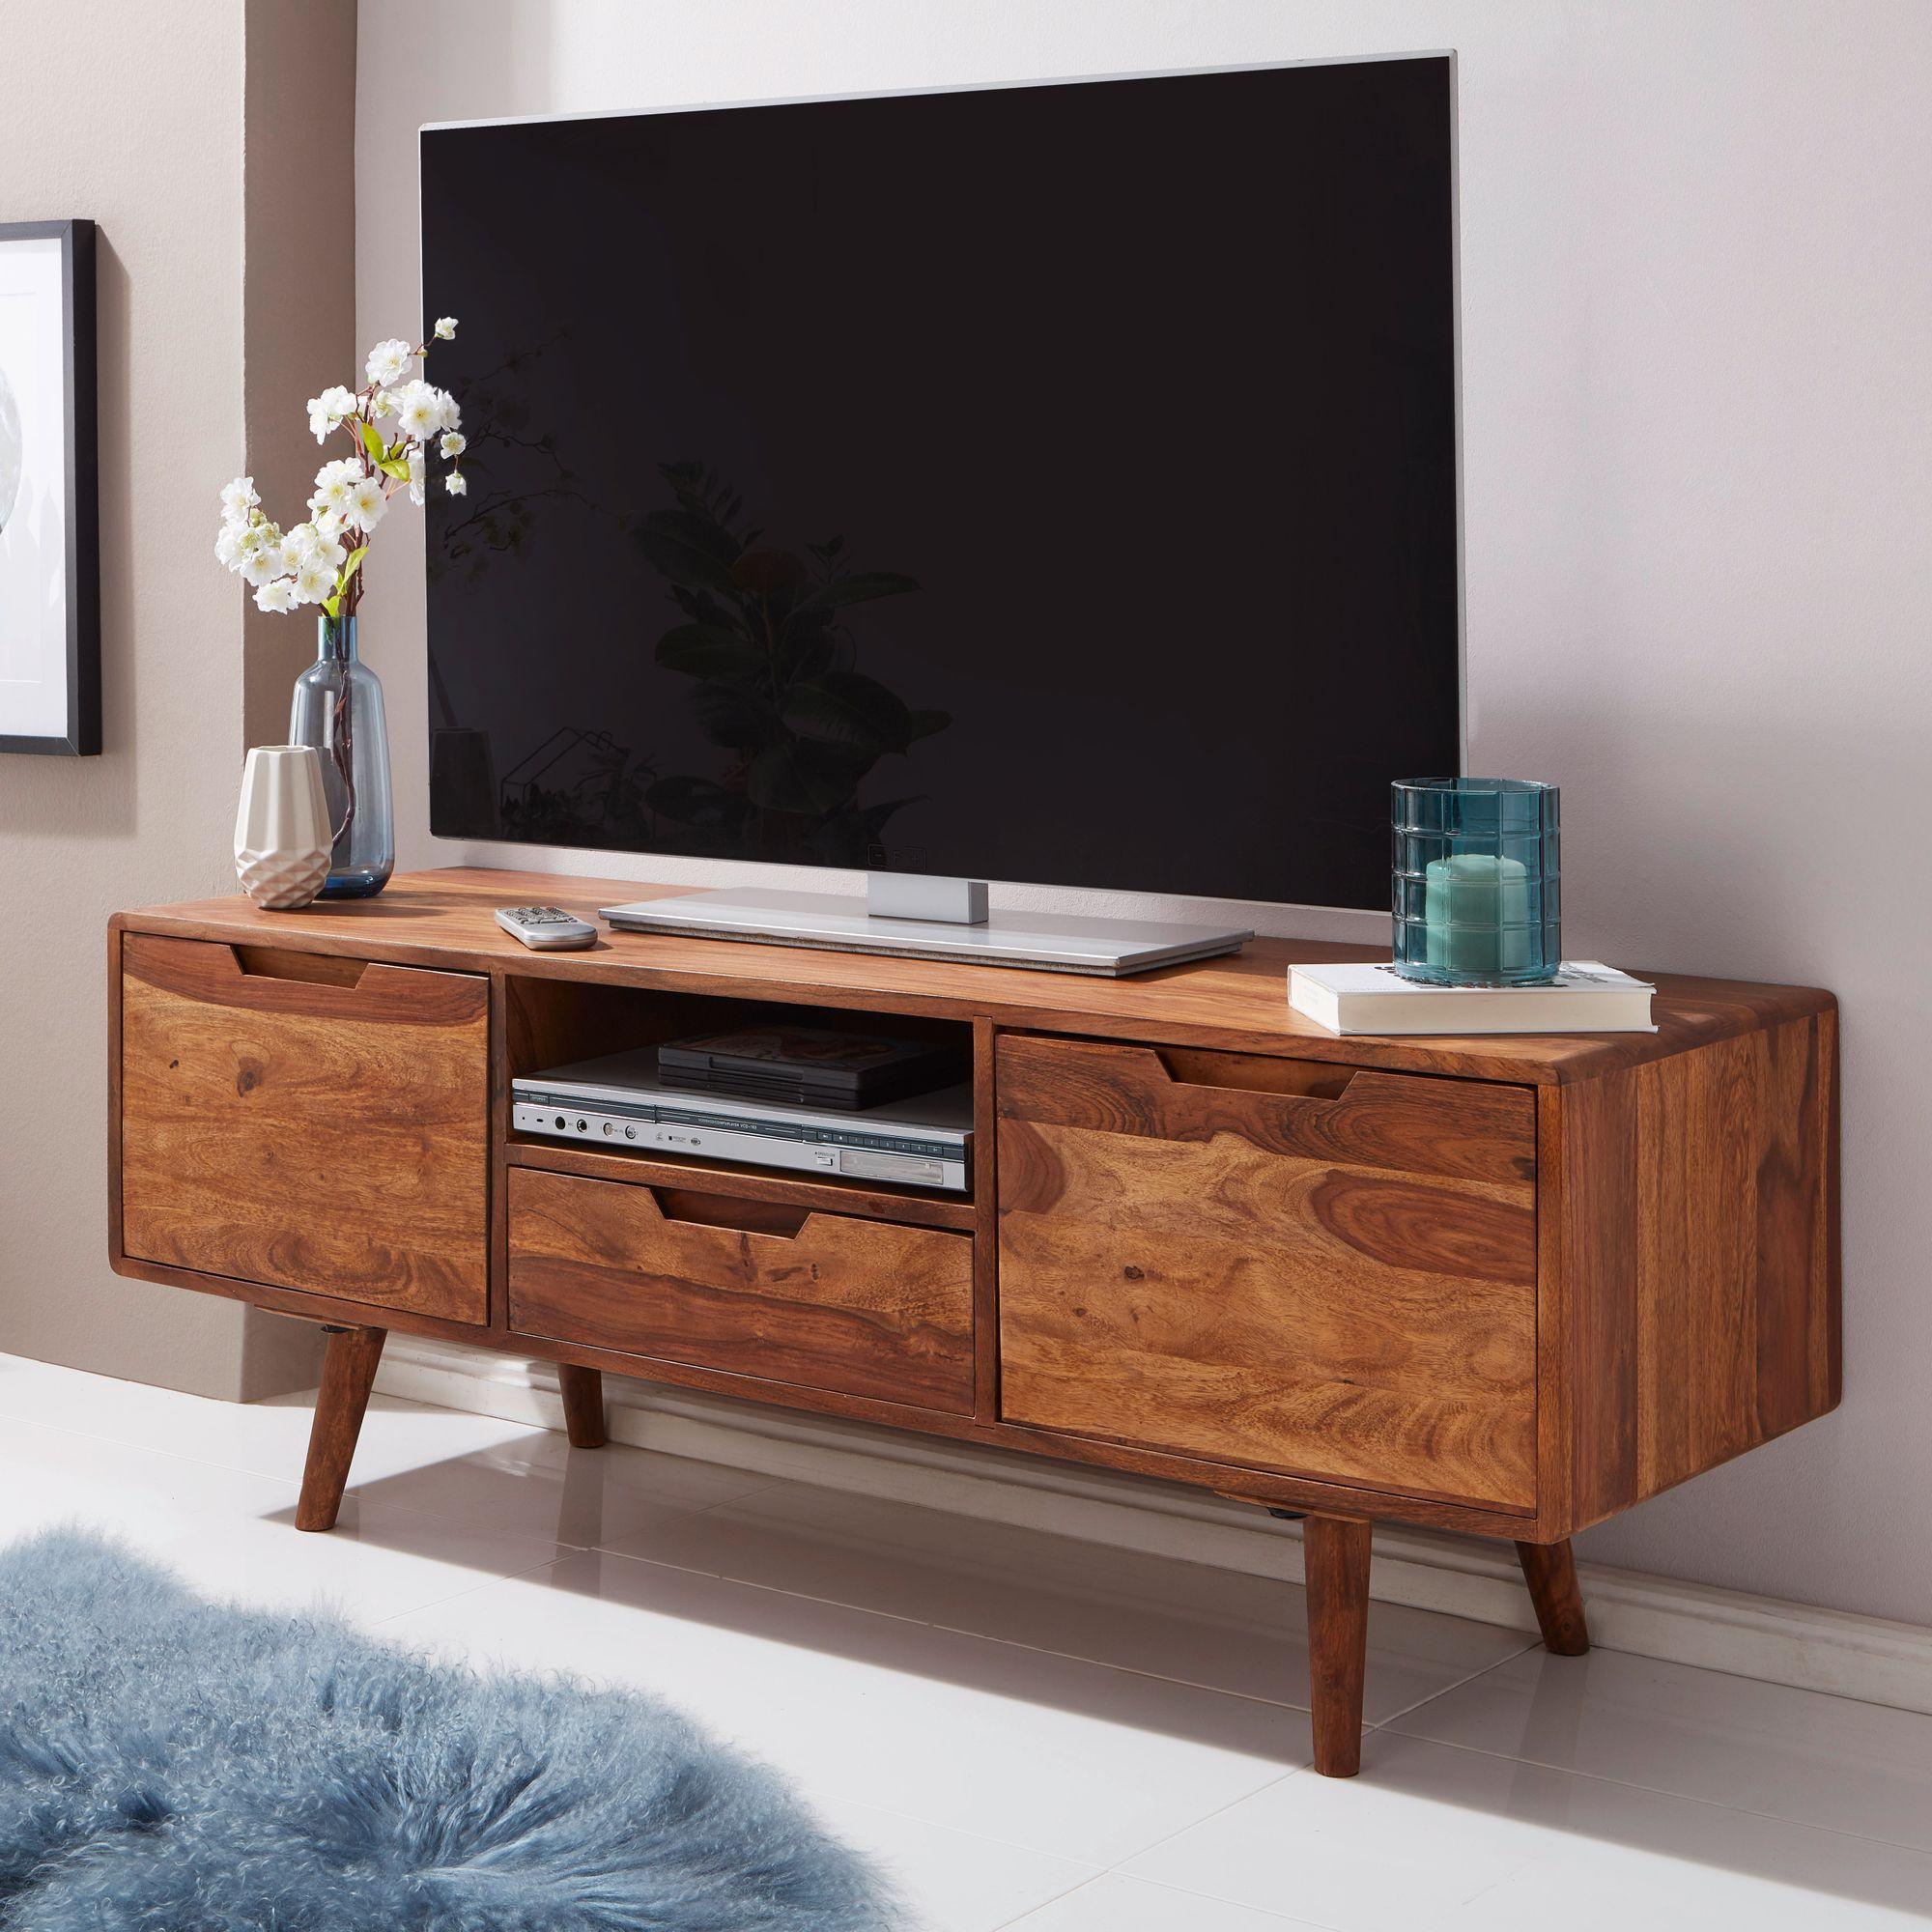 Finebuy Tv Lowboard Holz Fernsehkommode Massiv Landhaus